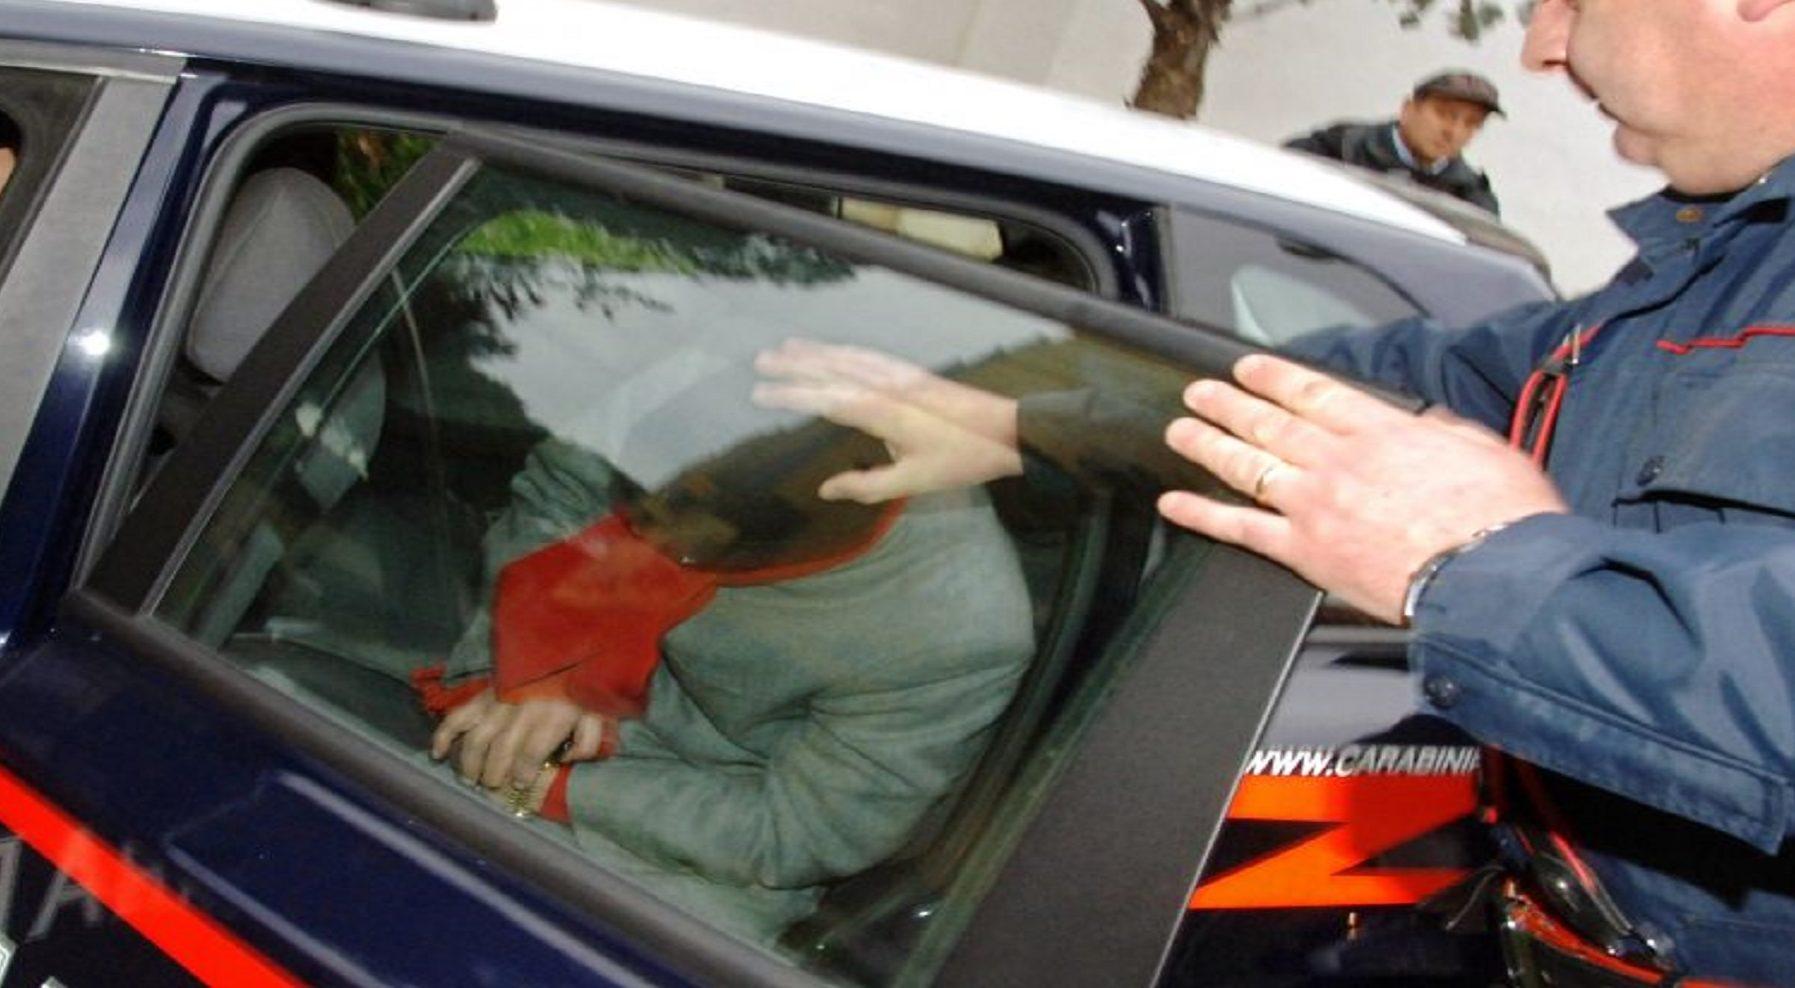 Abusi su disabile minorenne, 30enne arrestato in Irpinia